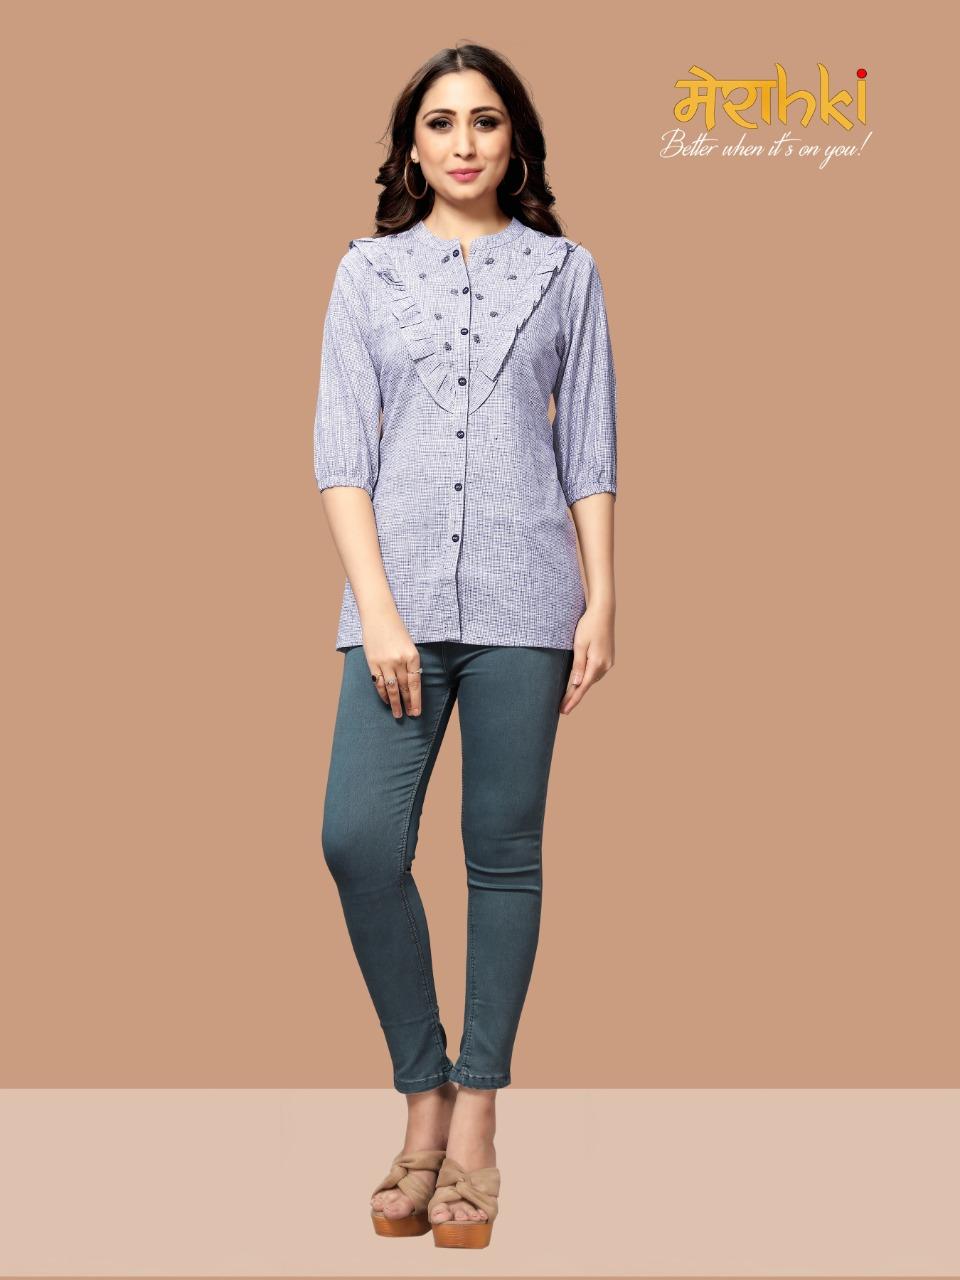 Merahki Present Leeona Cotton Handloom Short Top And Tunics Collection